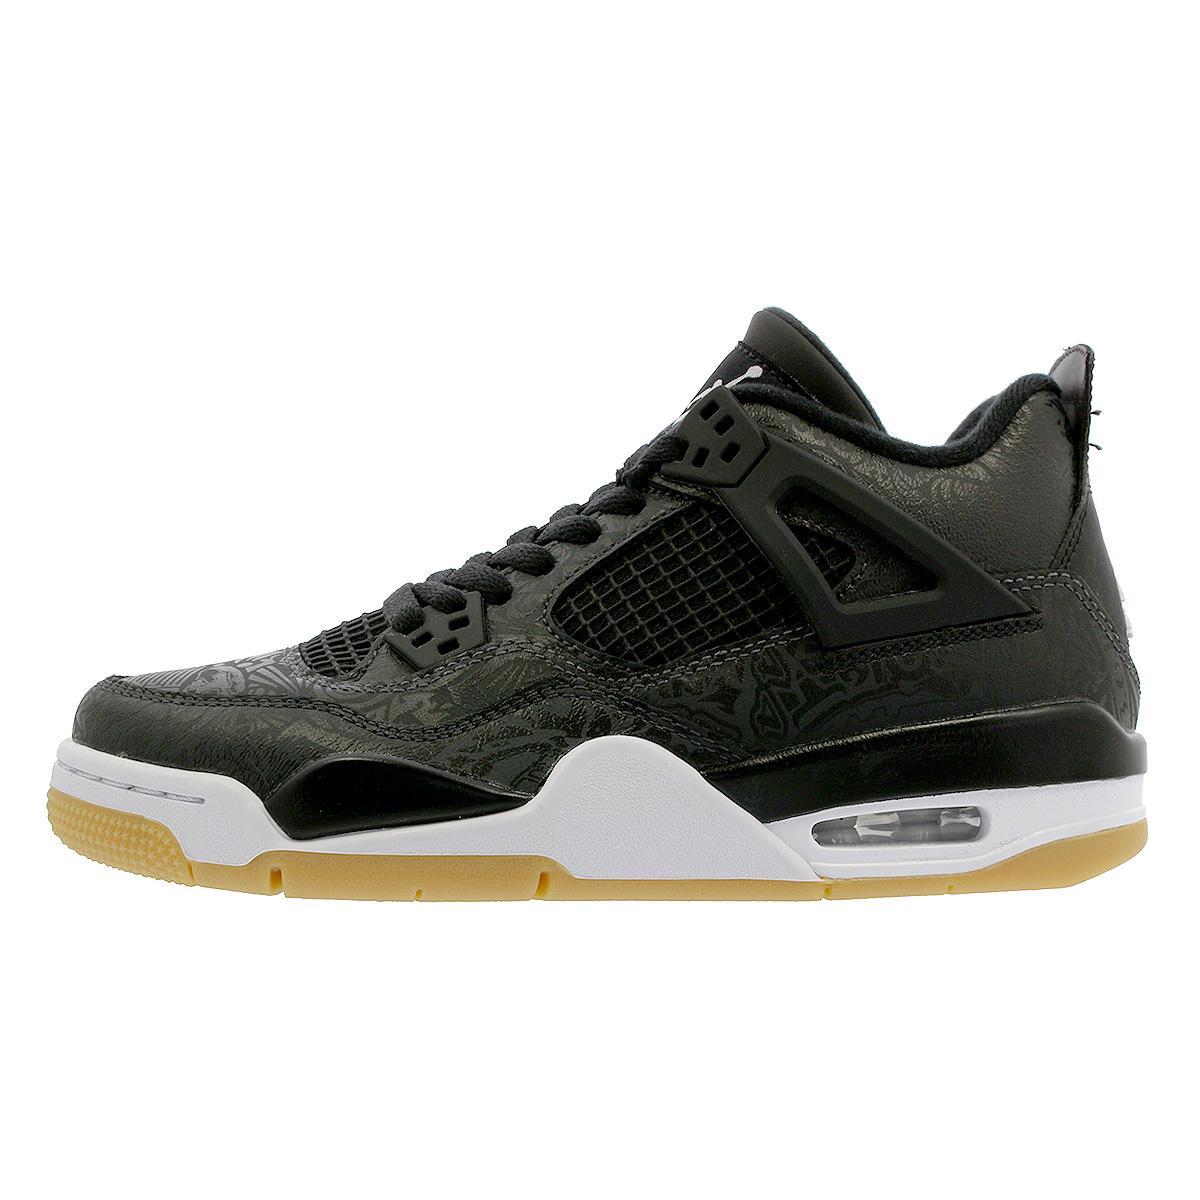 newest 89106 605ef NIKE AIR JORDAN 4 RETRO SE GS Nike Air Jordan 4 nostalgic SE GS BLACK WHITE GUM  LIGHT BROWN ci2970-001